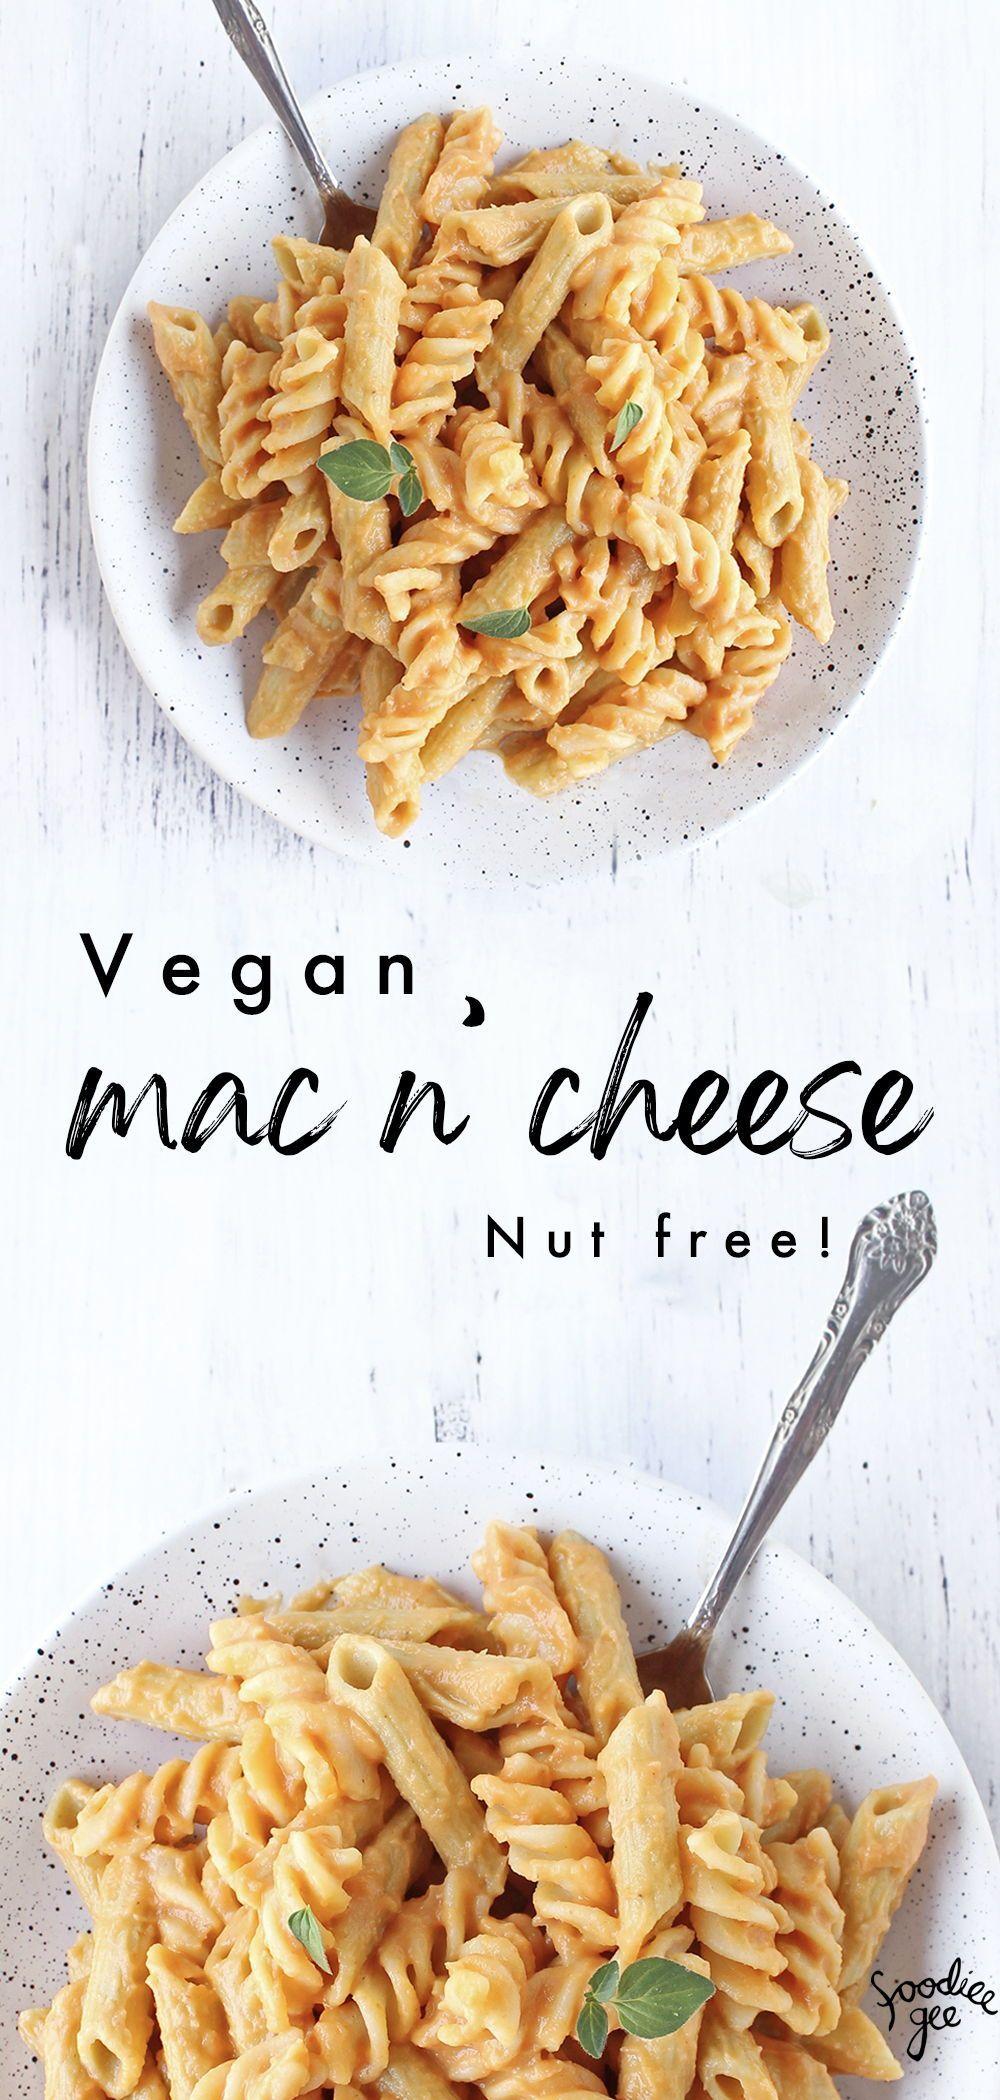 Vegan Mac And Cheese Nut Free In 2020 Vegan Eating Vegan Pasta Recipes Vegan Meal Plans